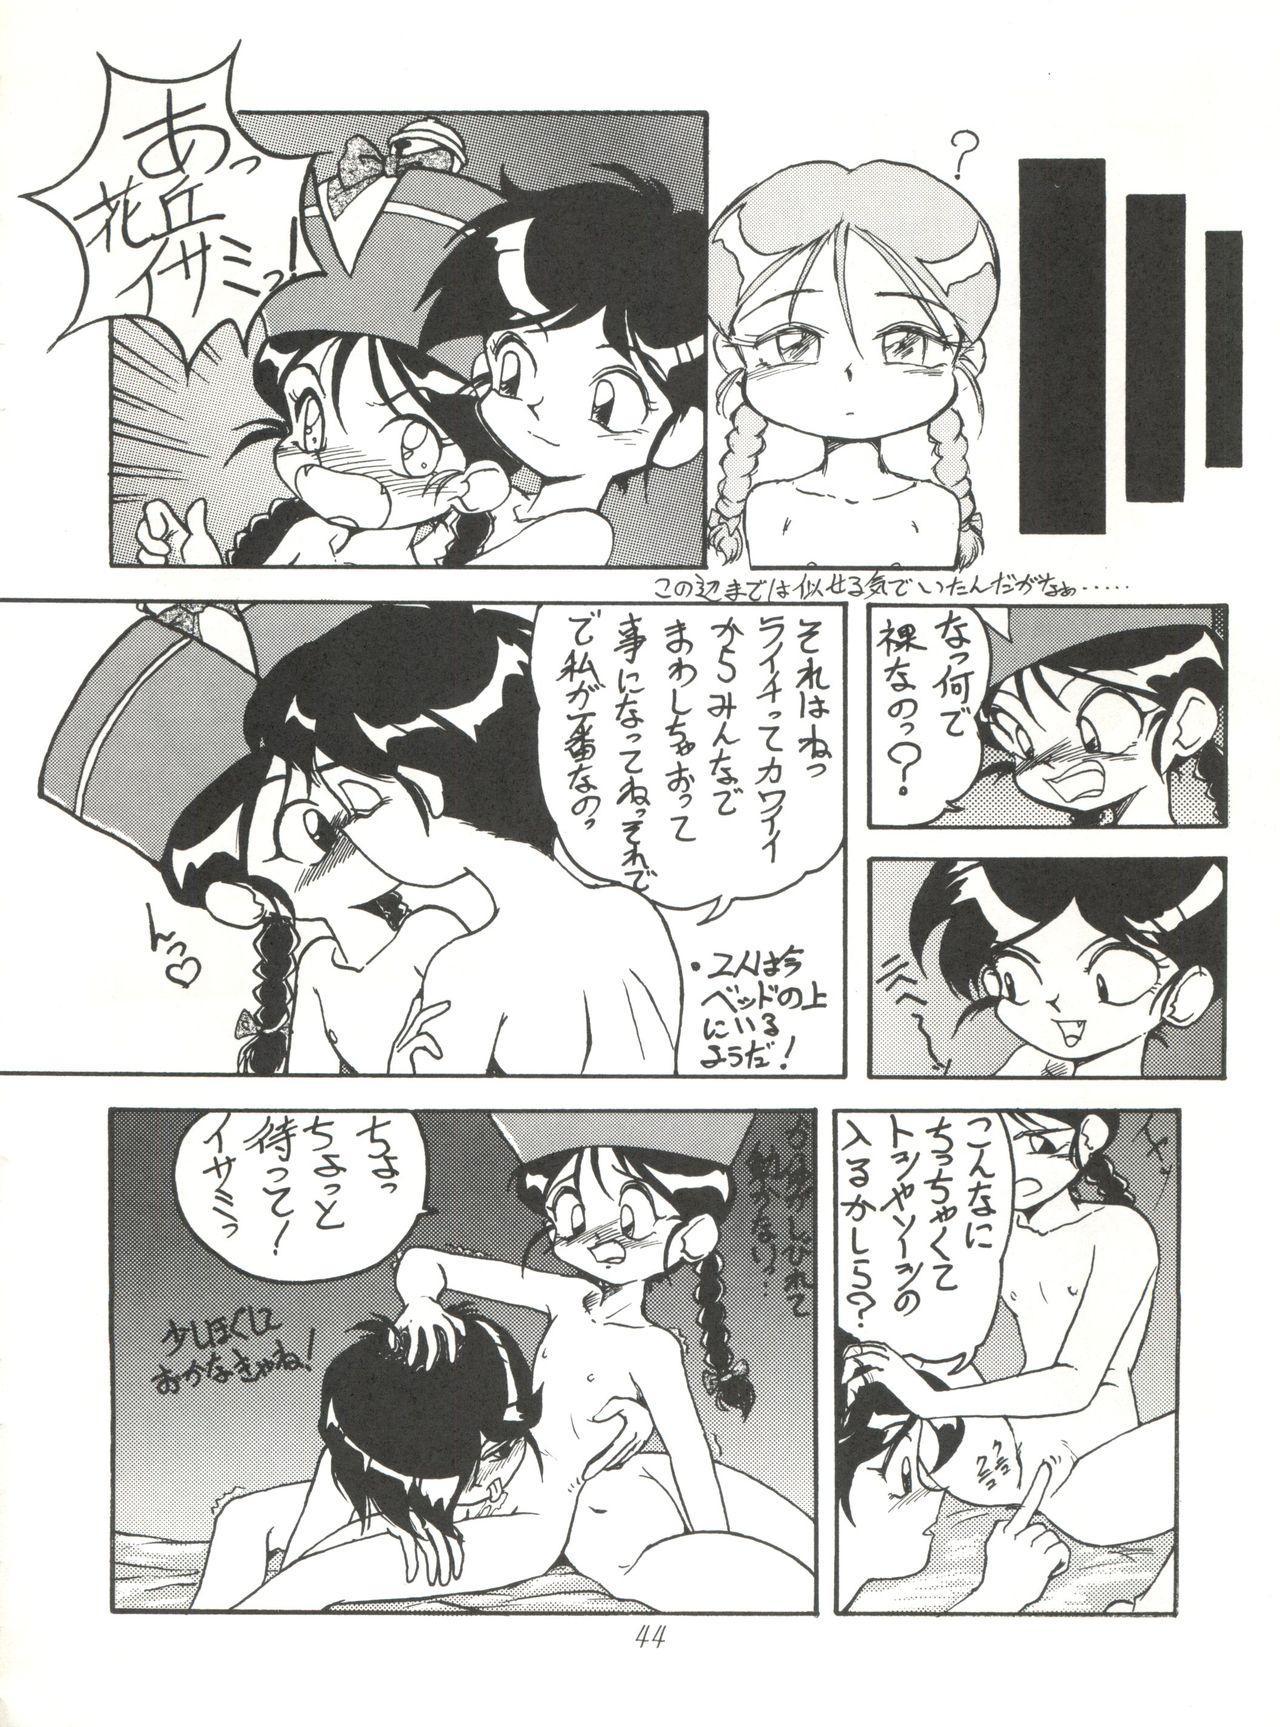 Heart o Migakukkya Nai 43